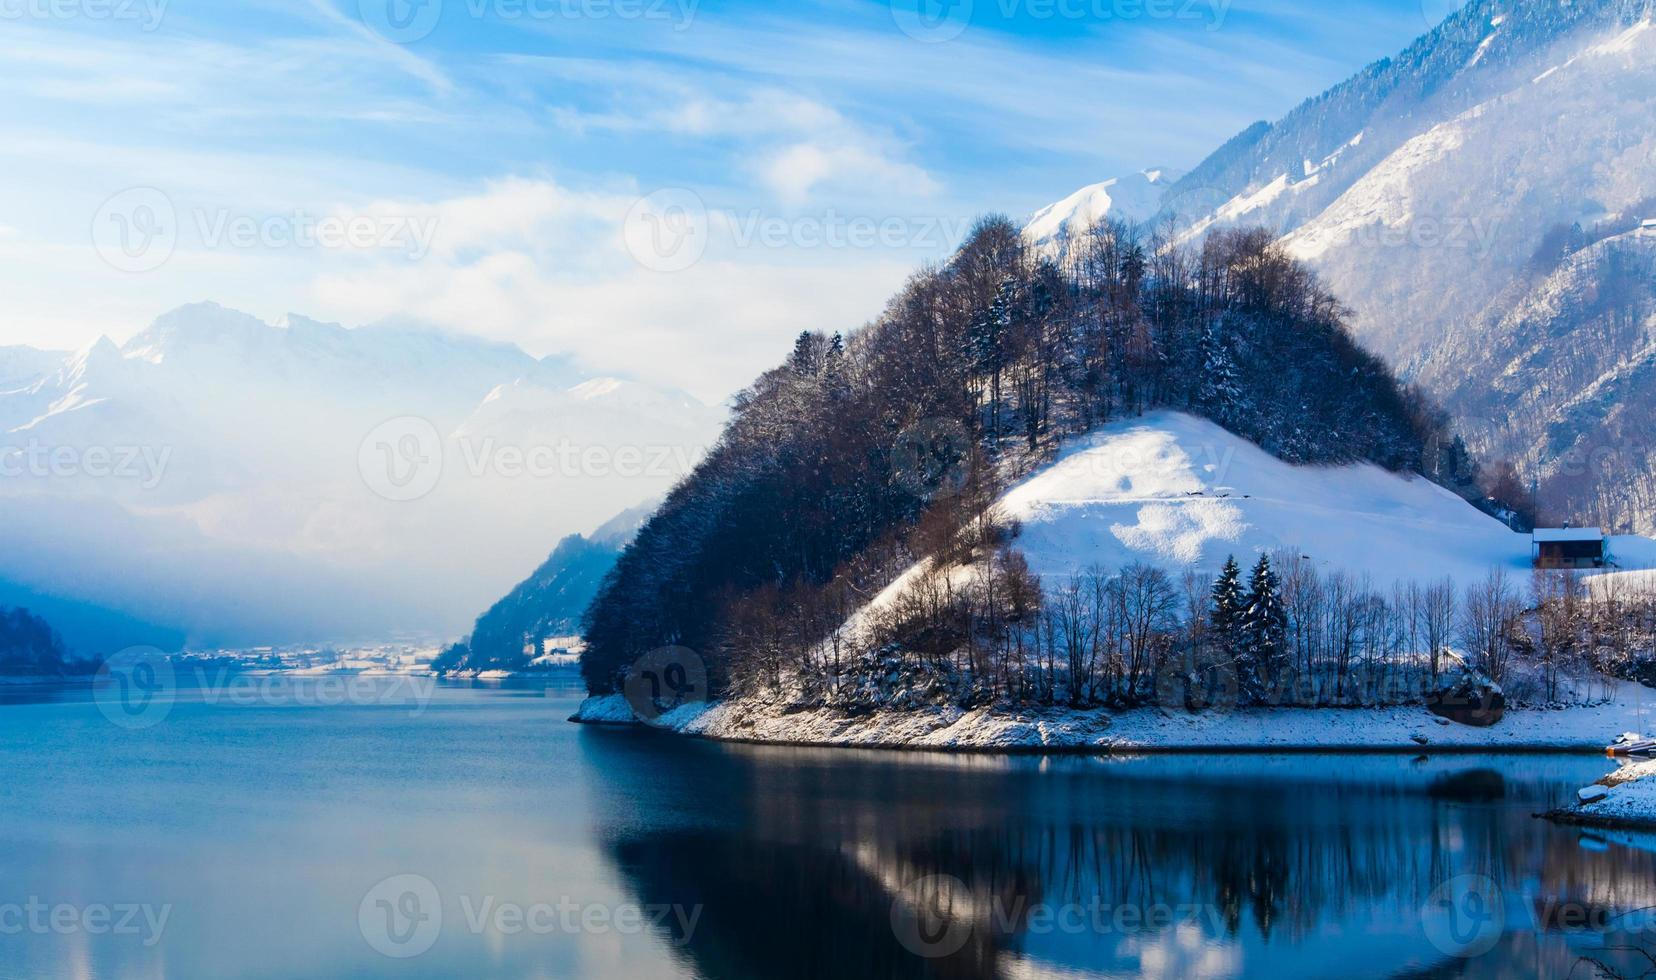 Winter in den Schweizer Alpen. foto